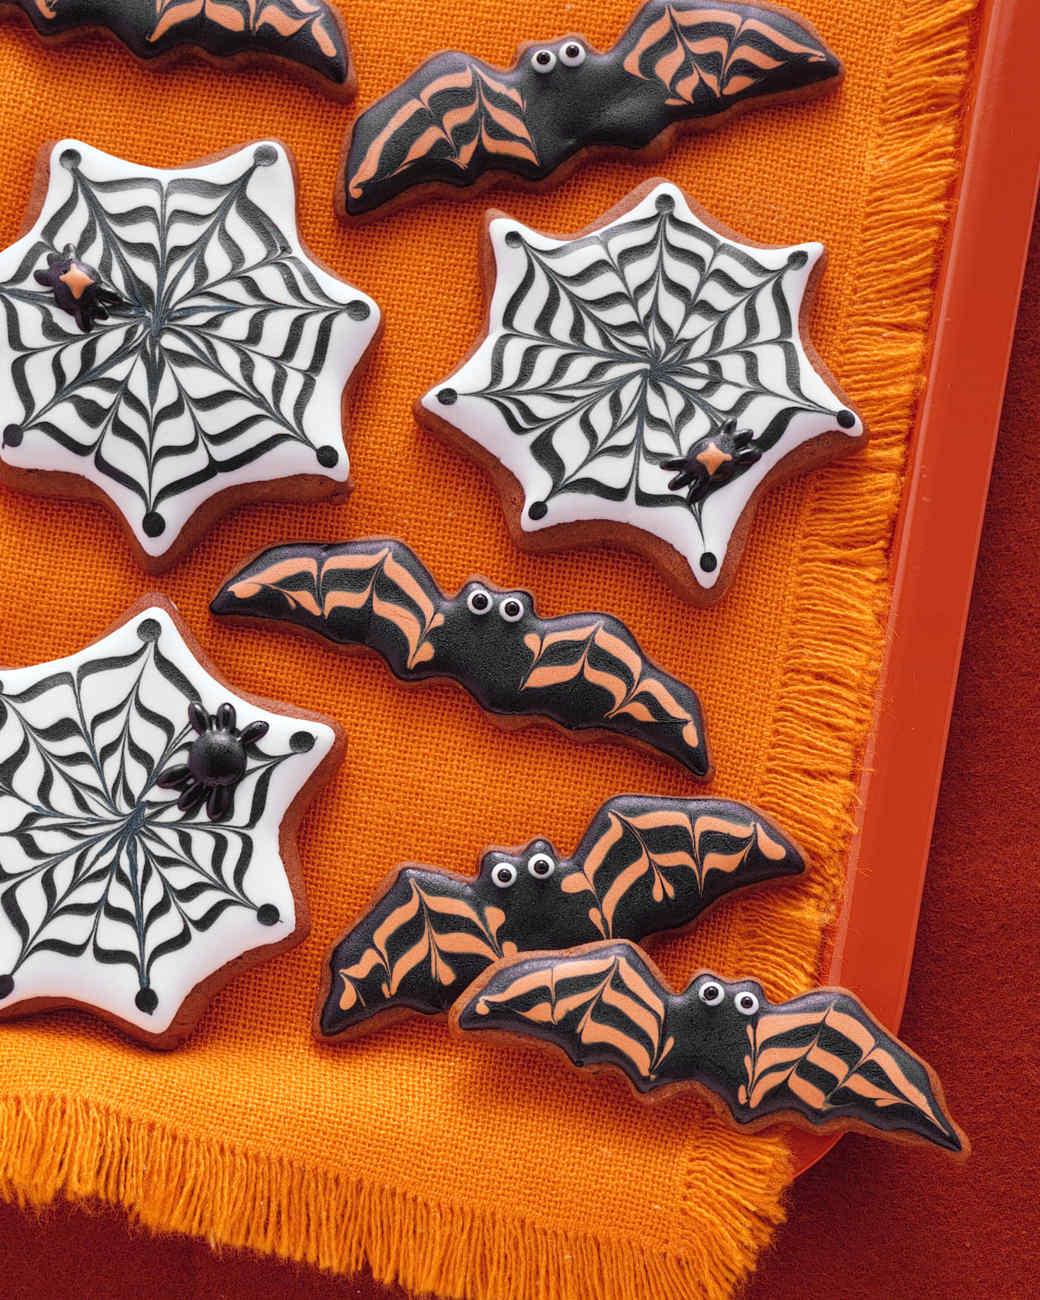 Bat and Cobweb Cookies